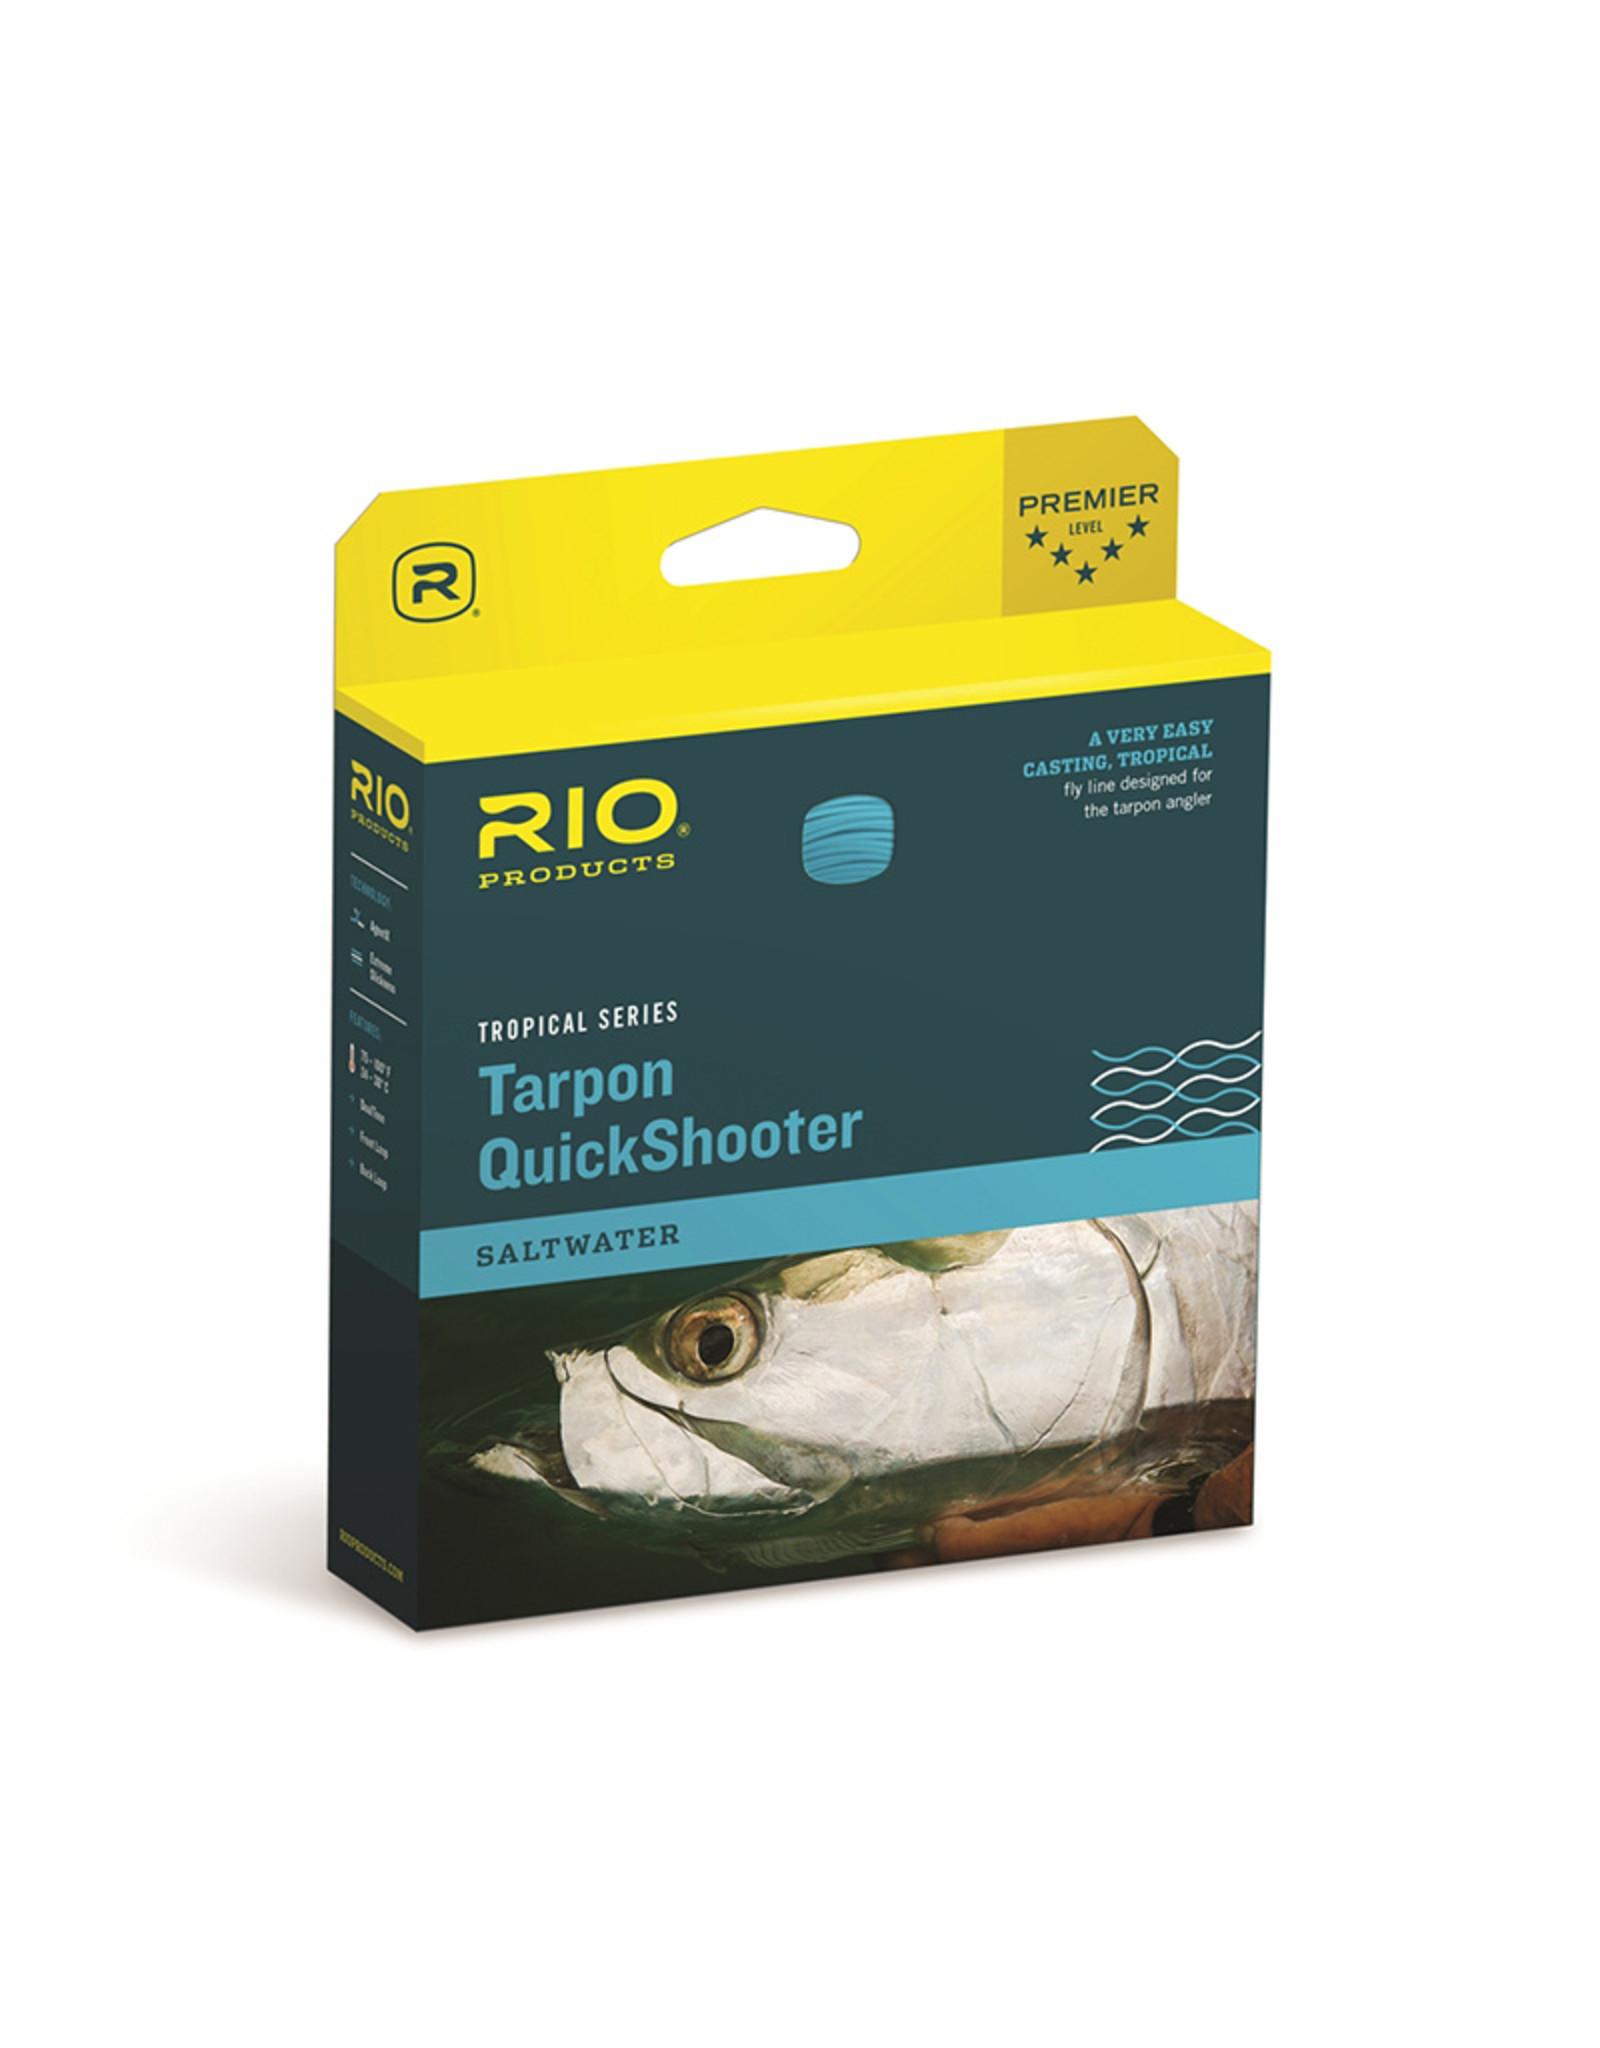 RIO Products Tarpon QuickShooter